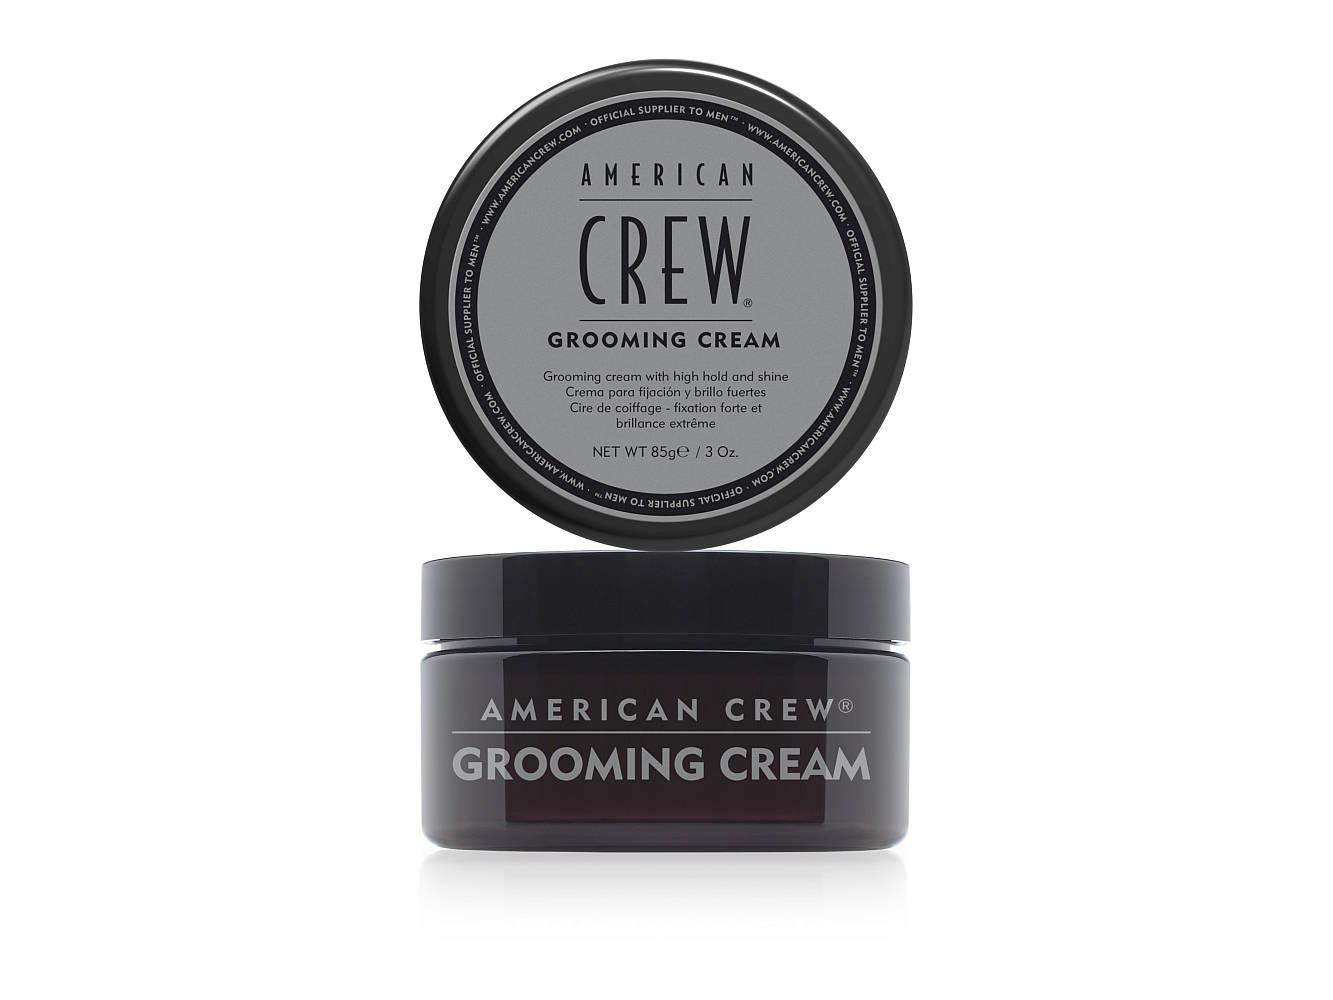 Arma Beauty - American Crew - Grooming Cream